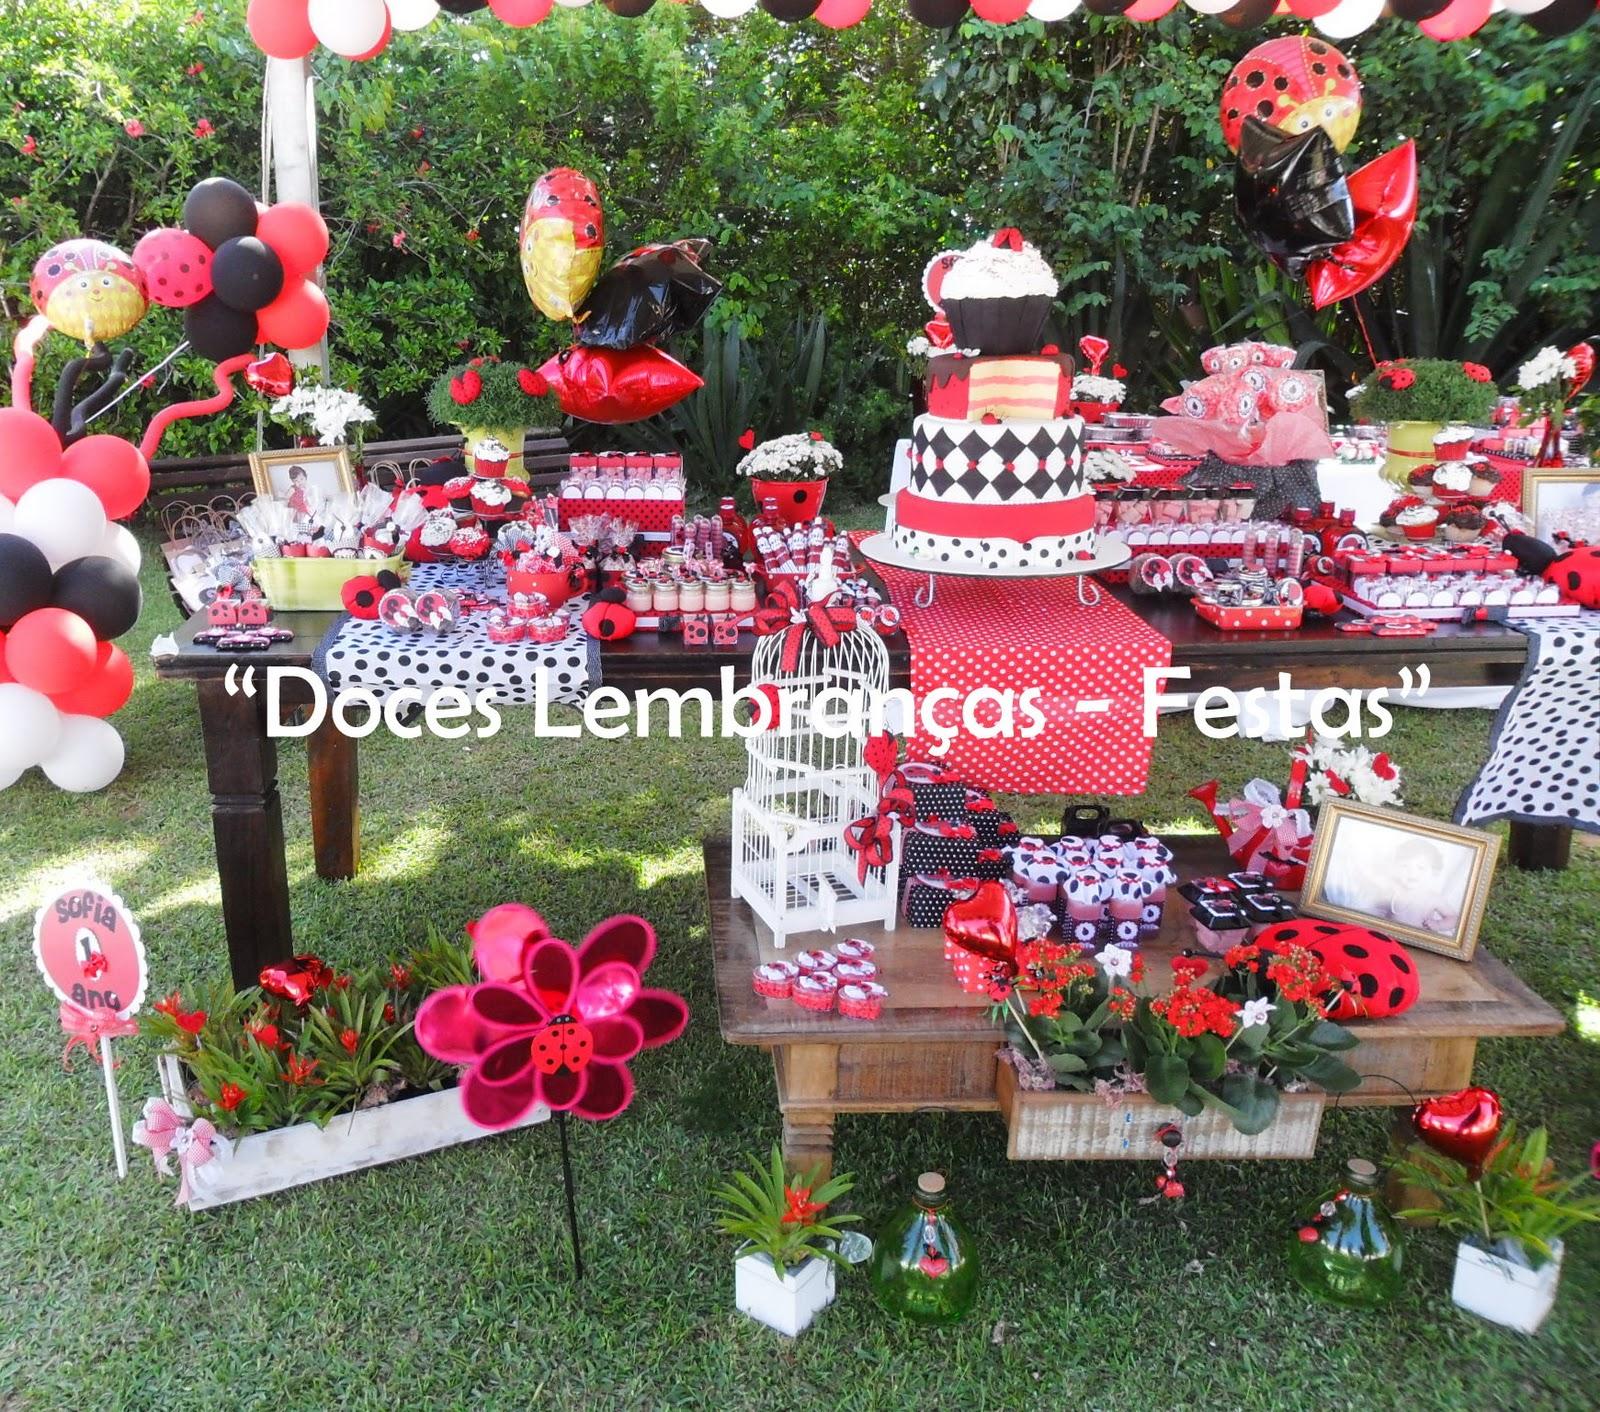 festa jardim da clarilu:Convite Tema Jardim Das Joaninhas Lembrancinhas Convite Tema Jardim